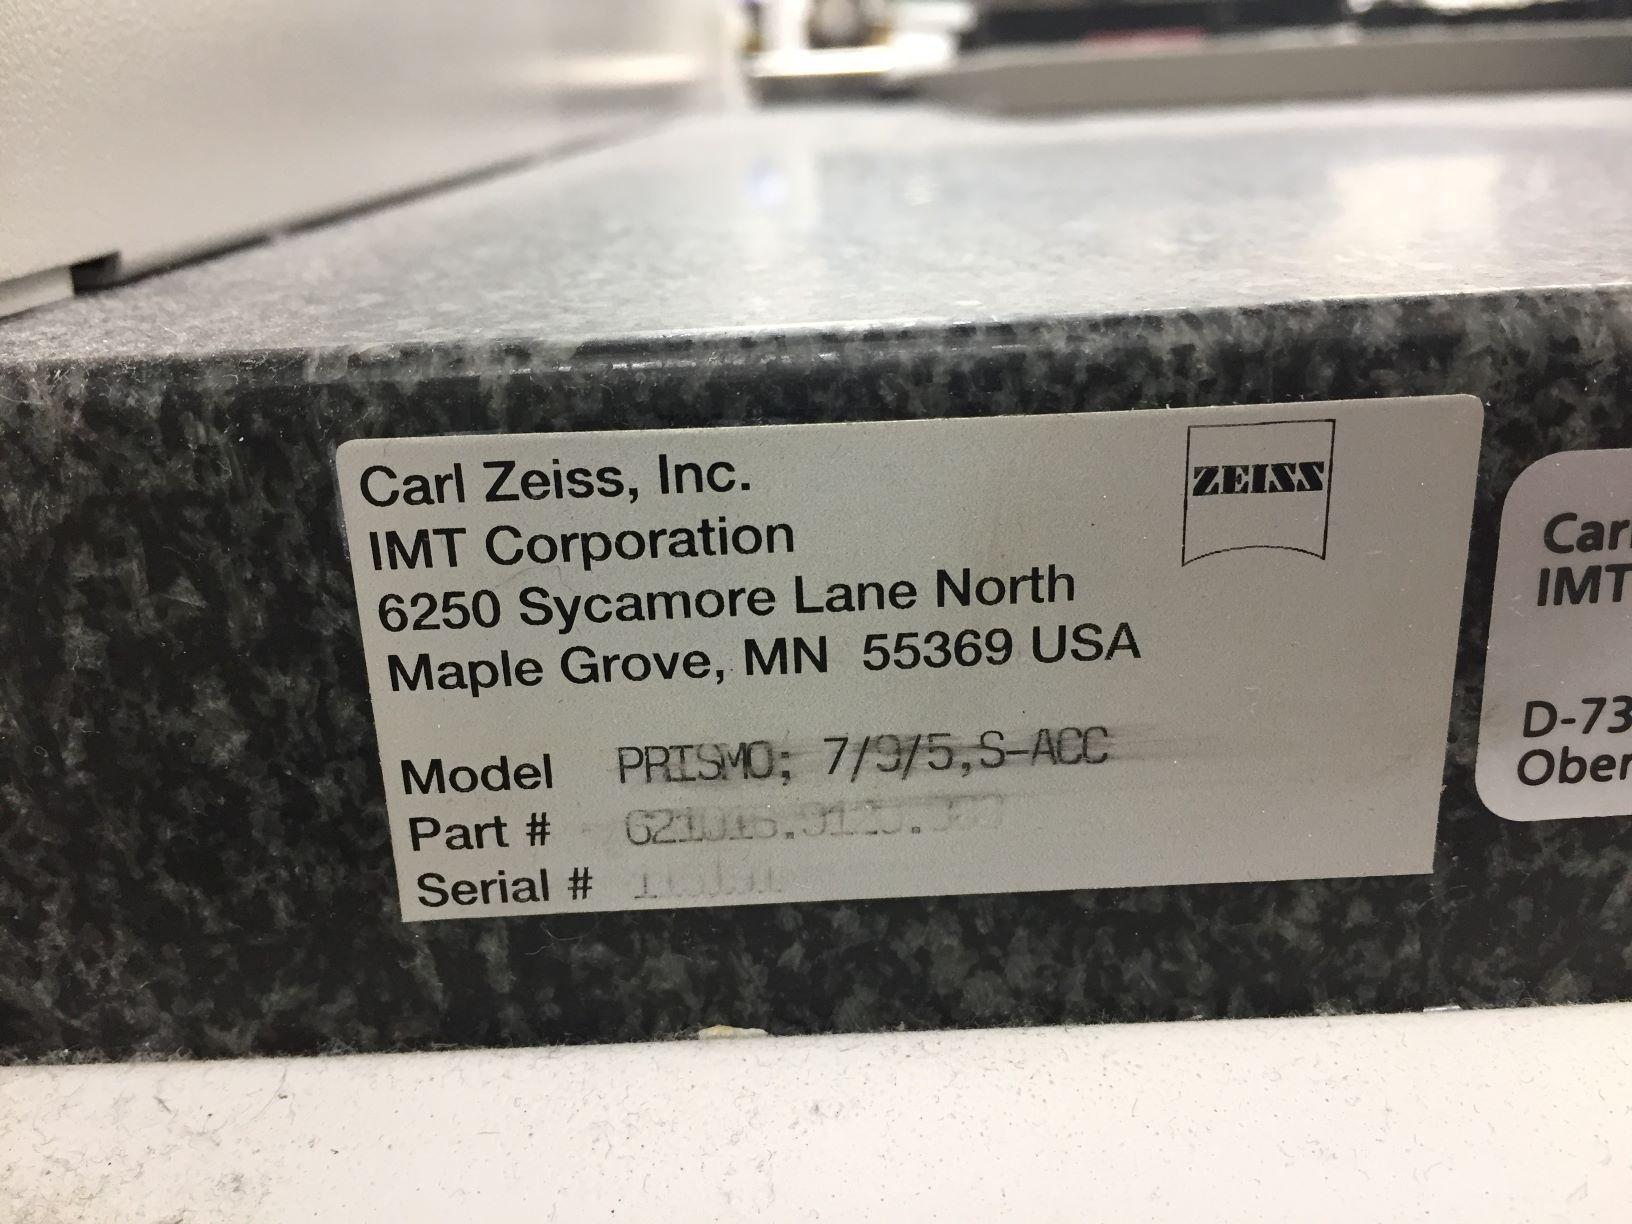 ZEISSZEISS PRISMO 7.9.5 DCC COORDINATE MEASURING MACHINE (CMM)